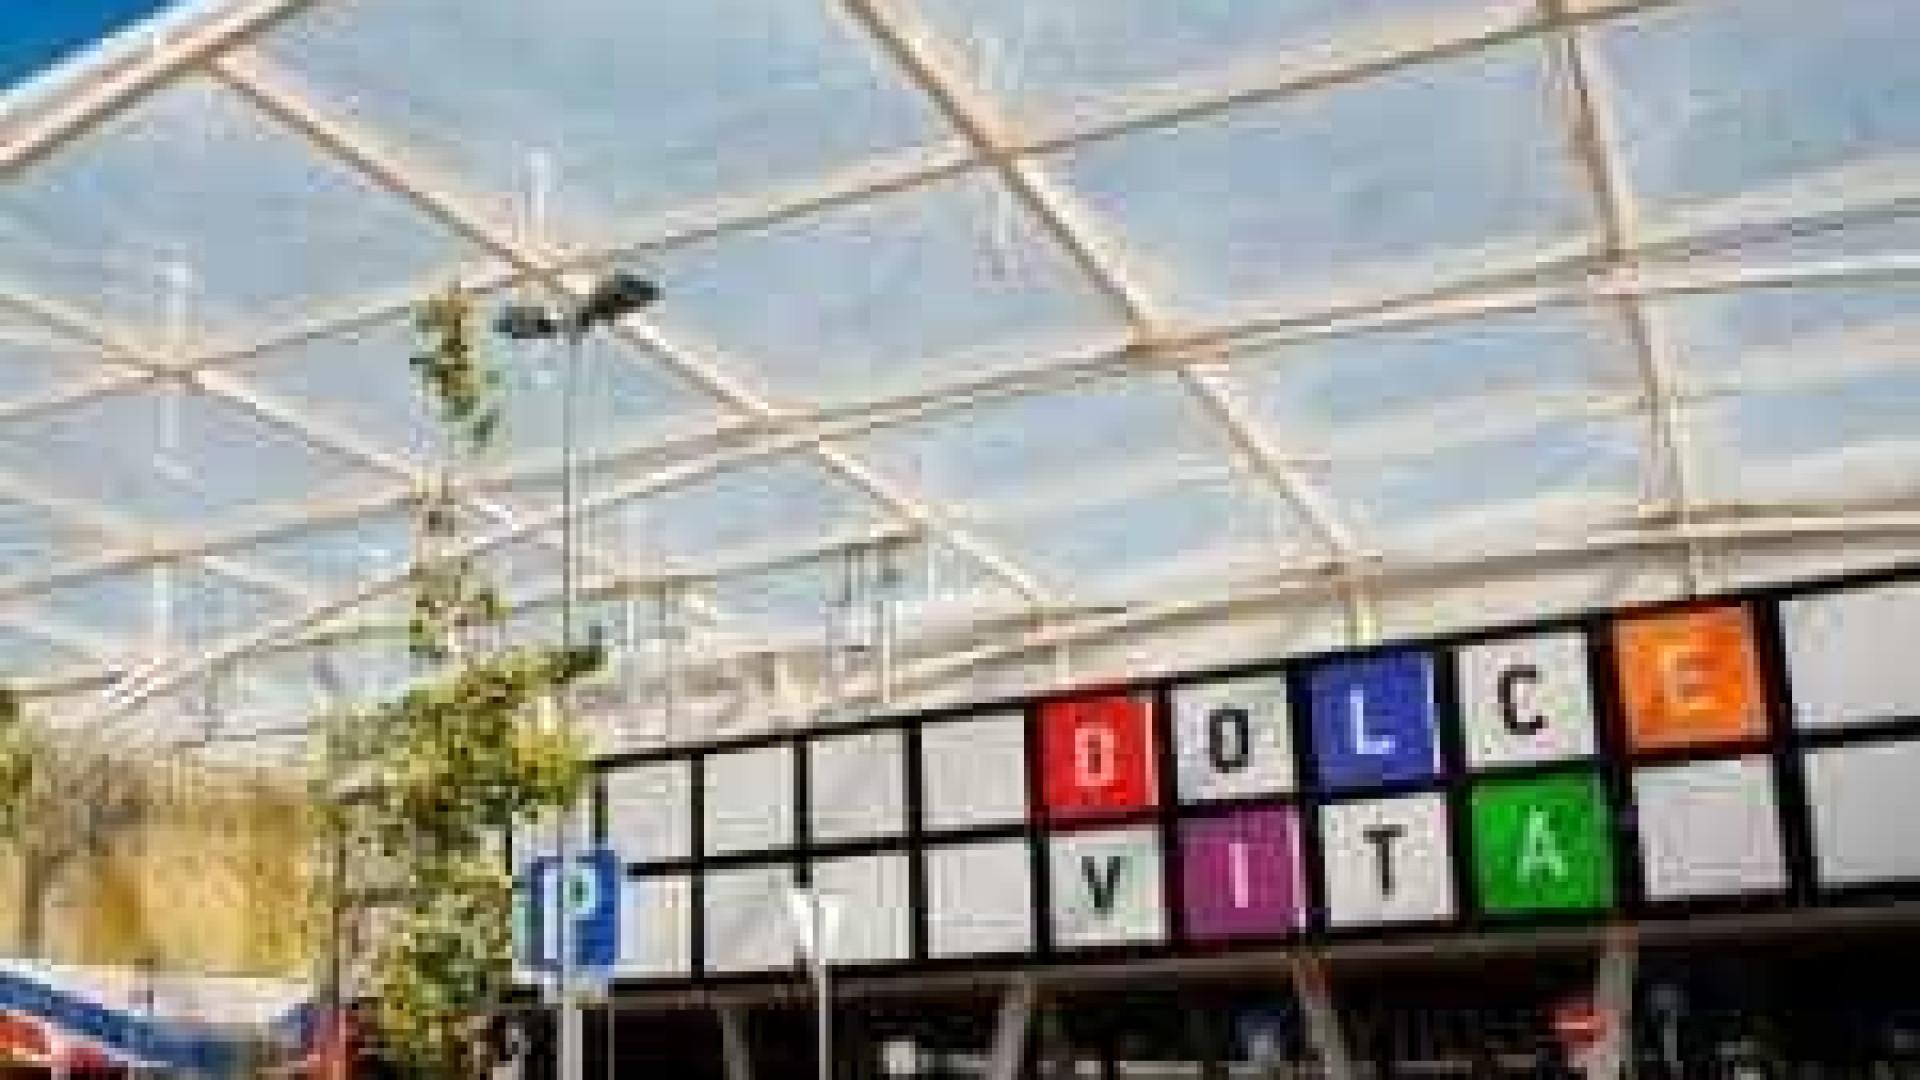 Quadrante vai desenvolverprojetode remodelação doDolceVita Tejo